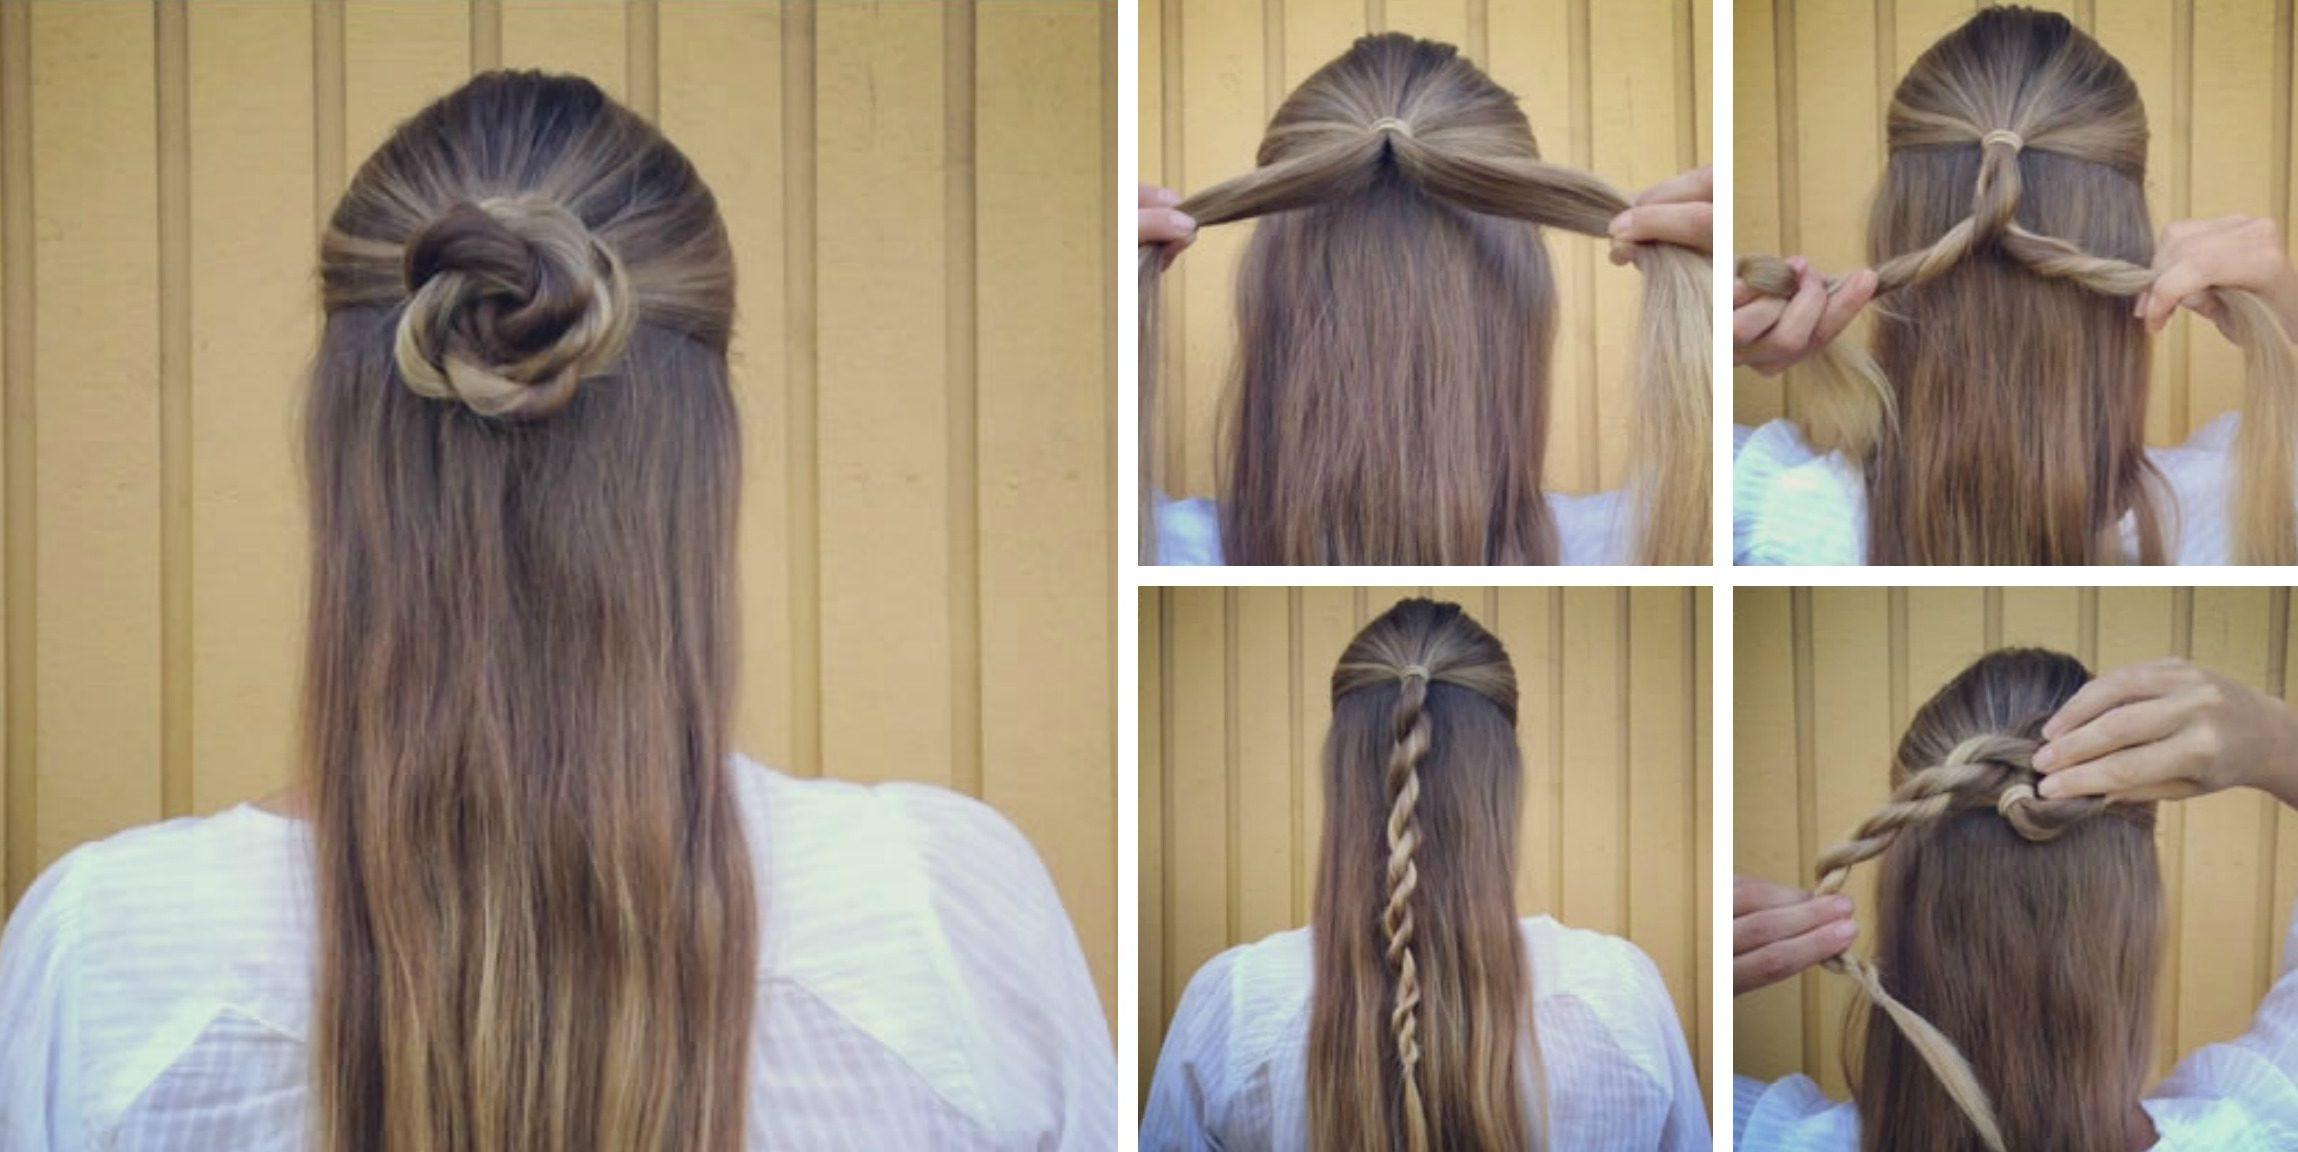 Причёски в форме цветов